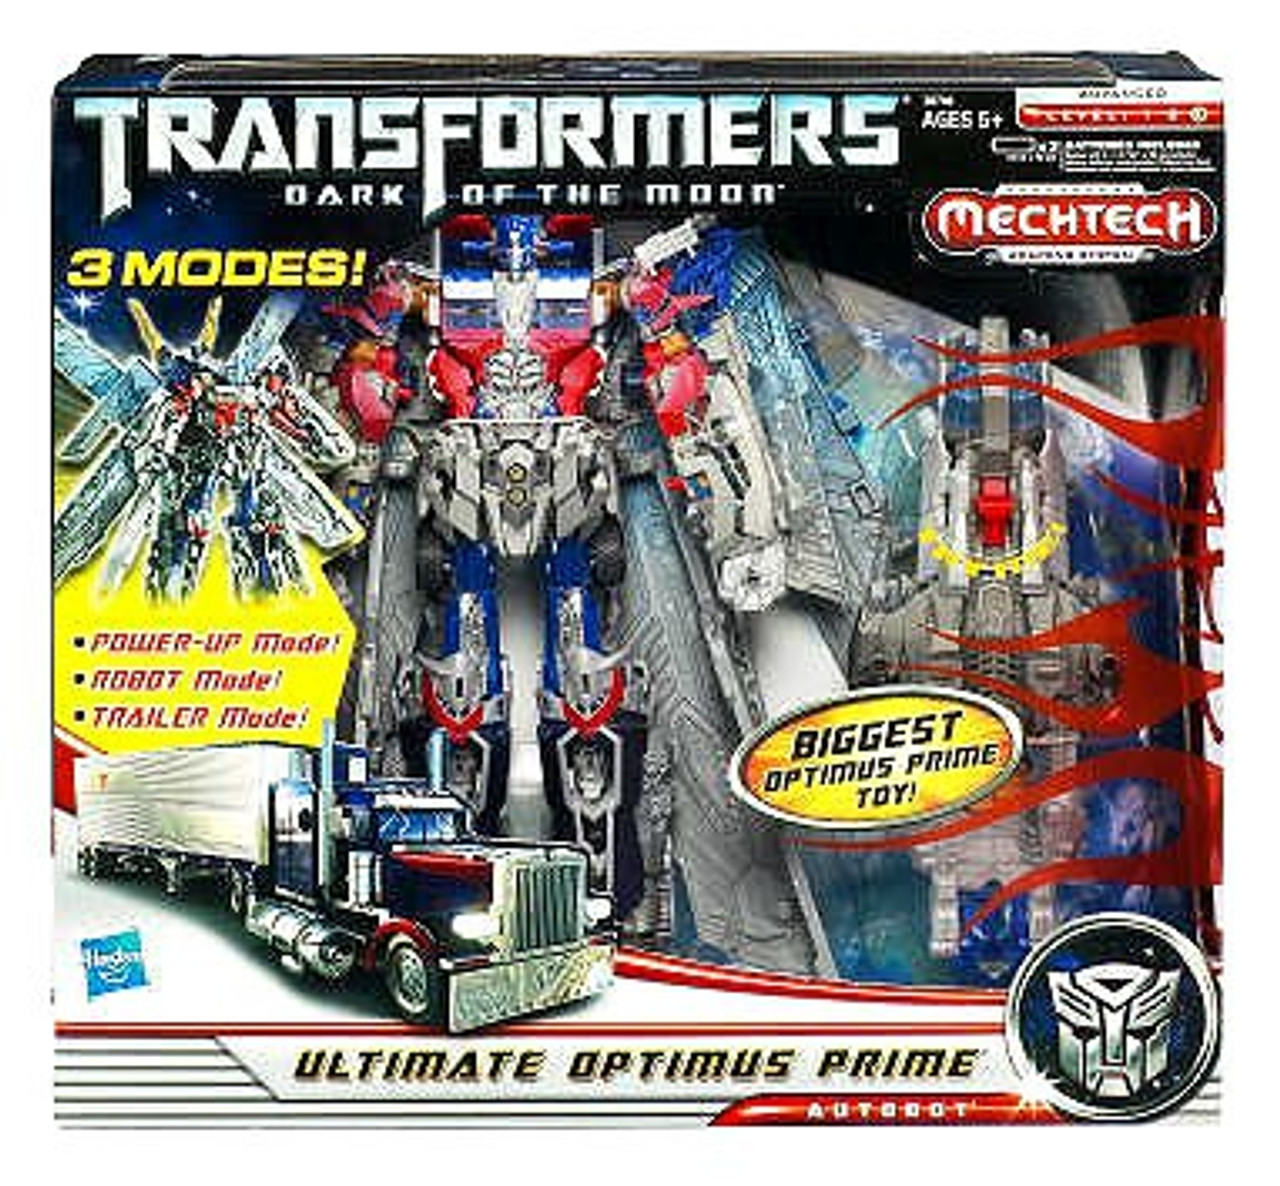 Transformers Dark of the Moon Mechtech Leader Ultimate Optimus Prime Leader Action Figure